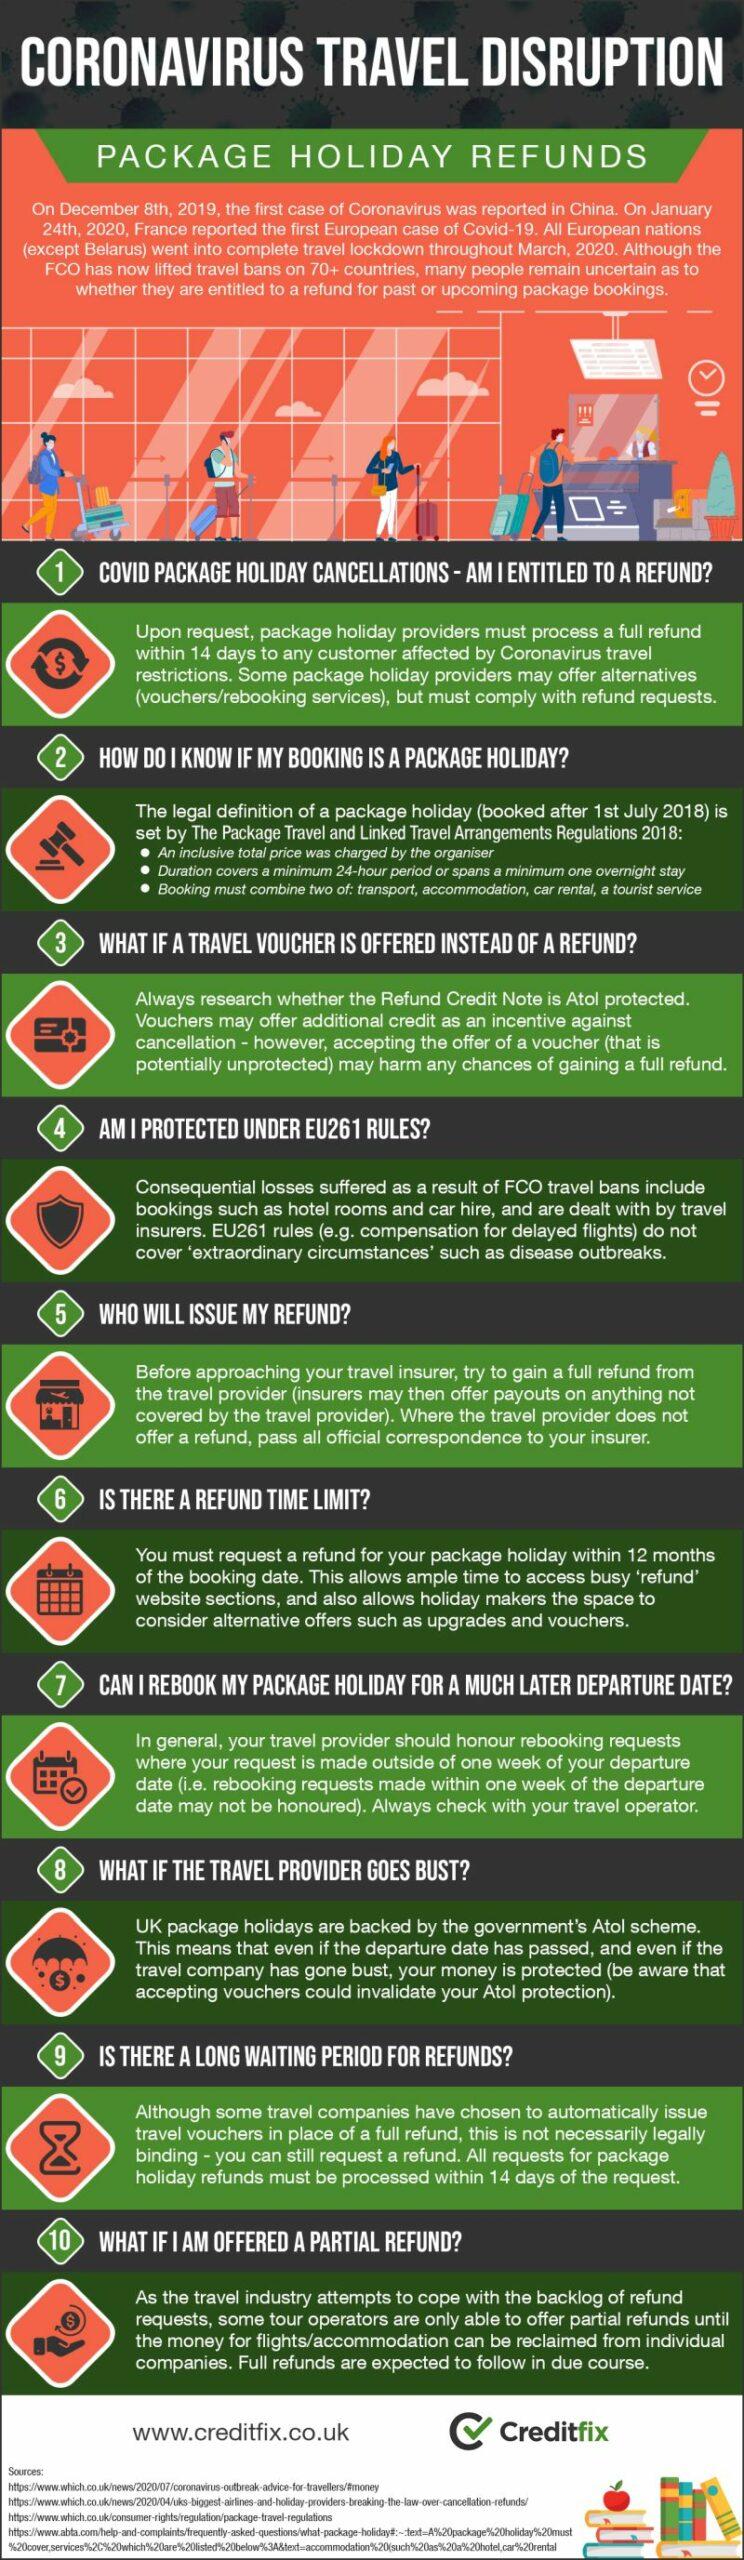 Coronavirus Travel Disruption Infographic